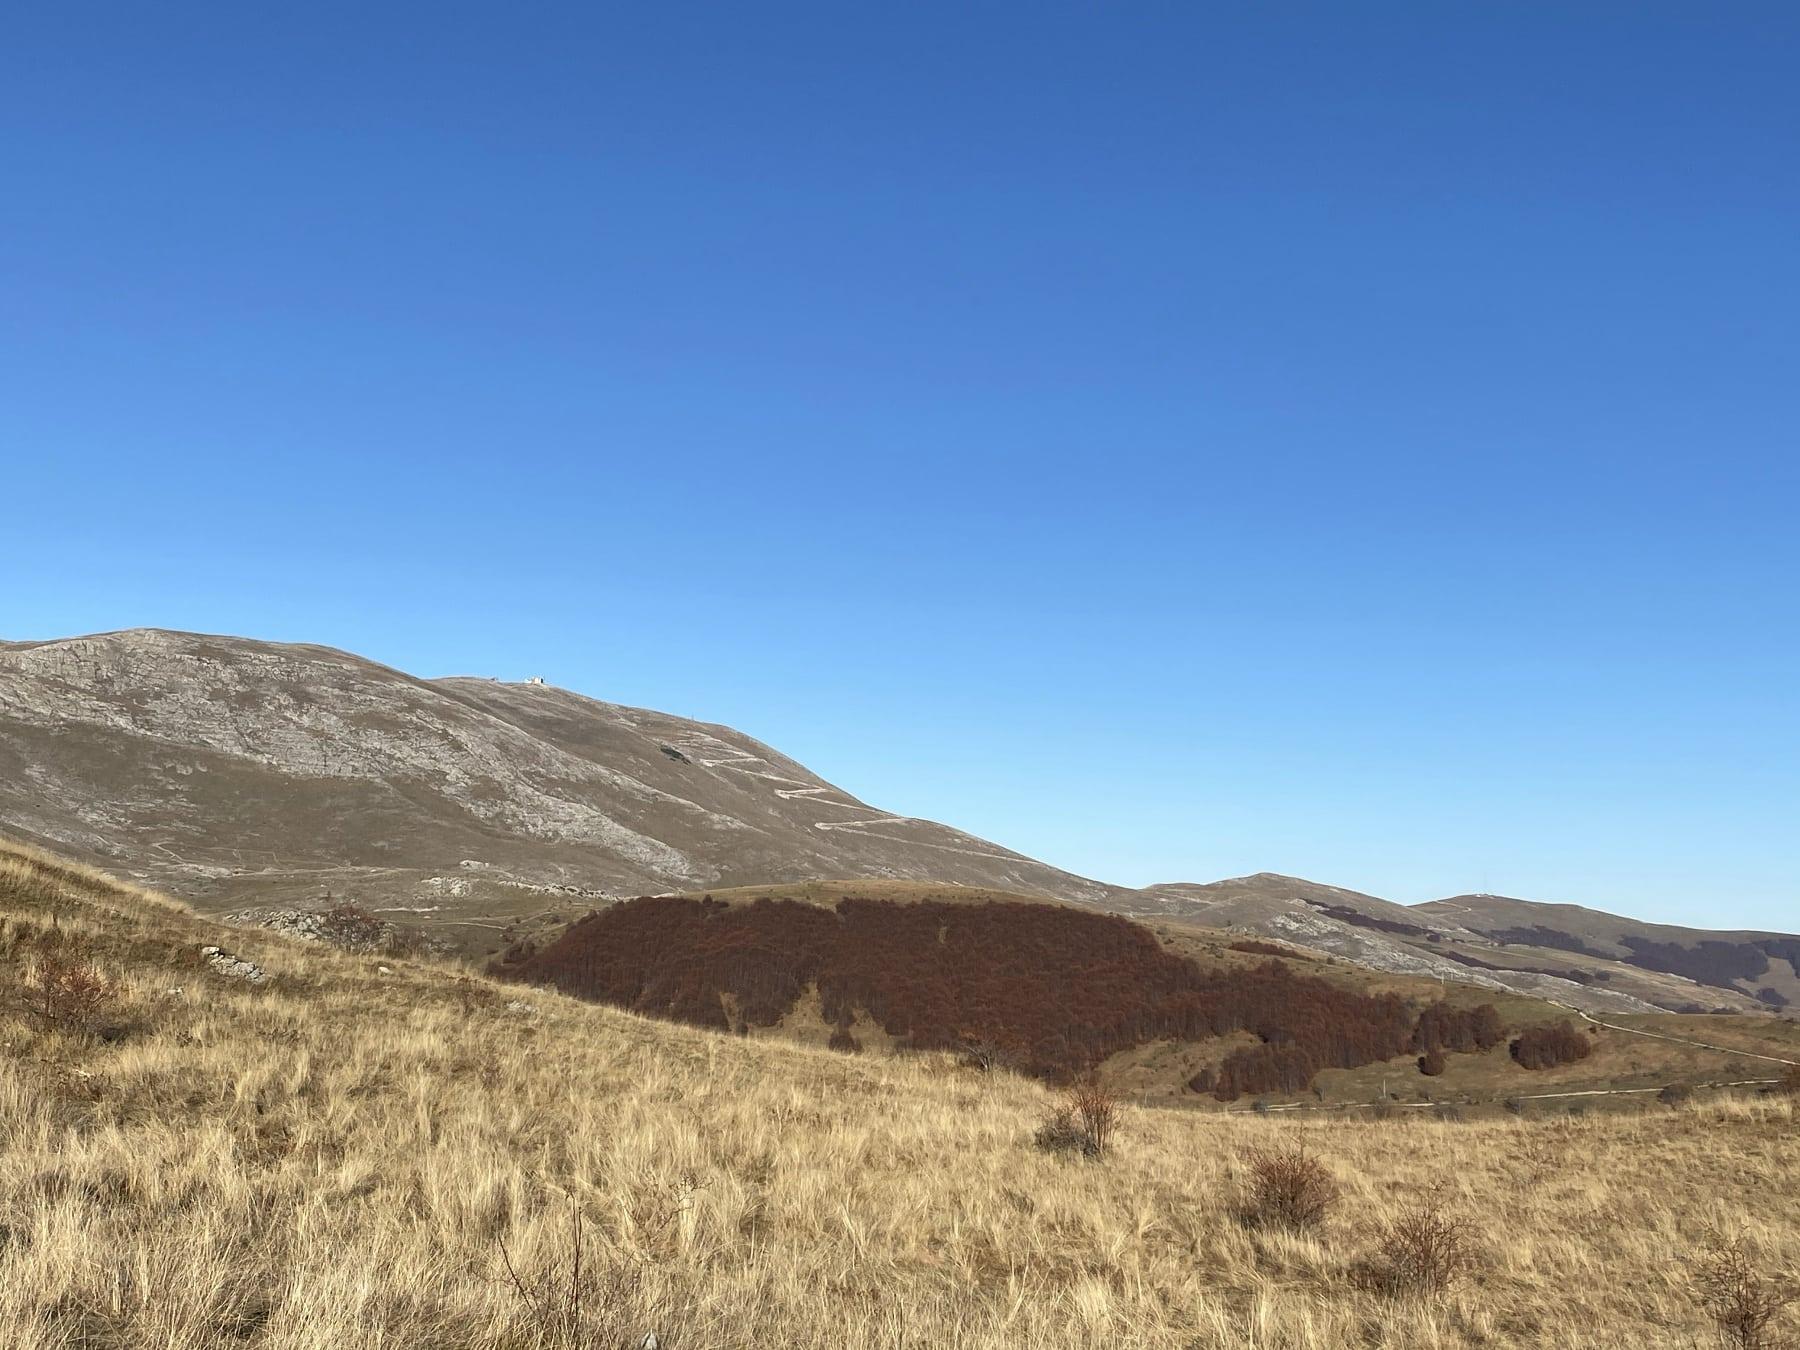 Mountain Village Umoljani - In Search of the Stone Dragon 5